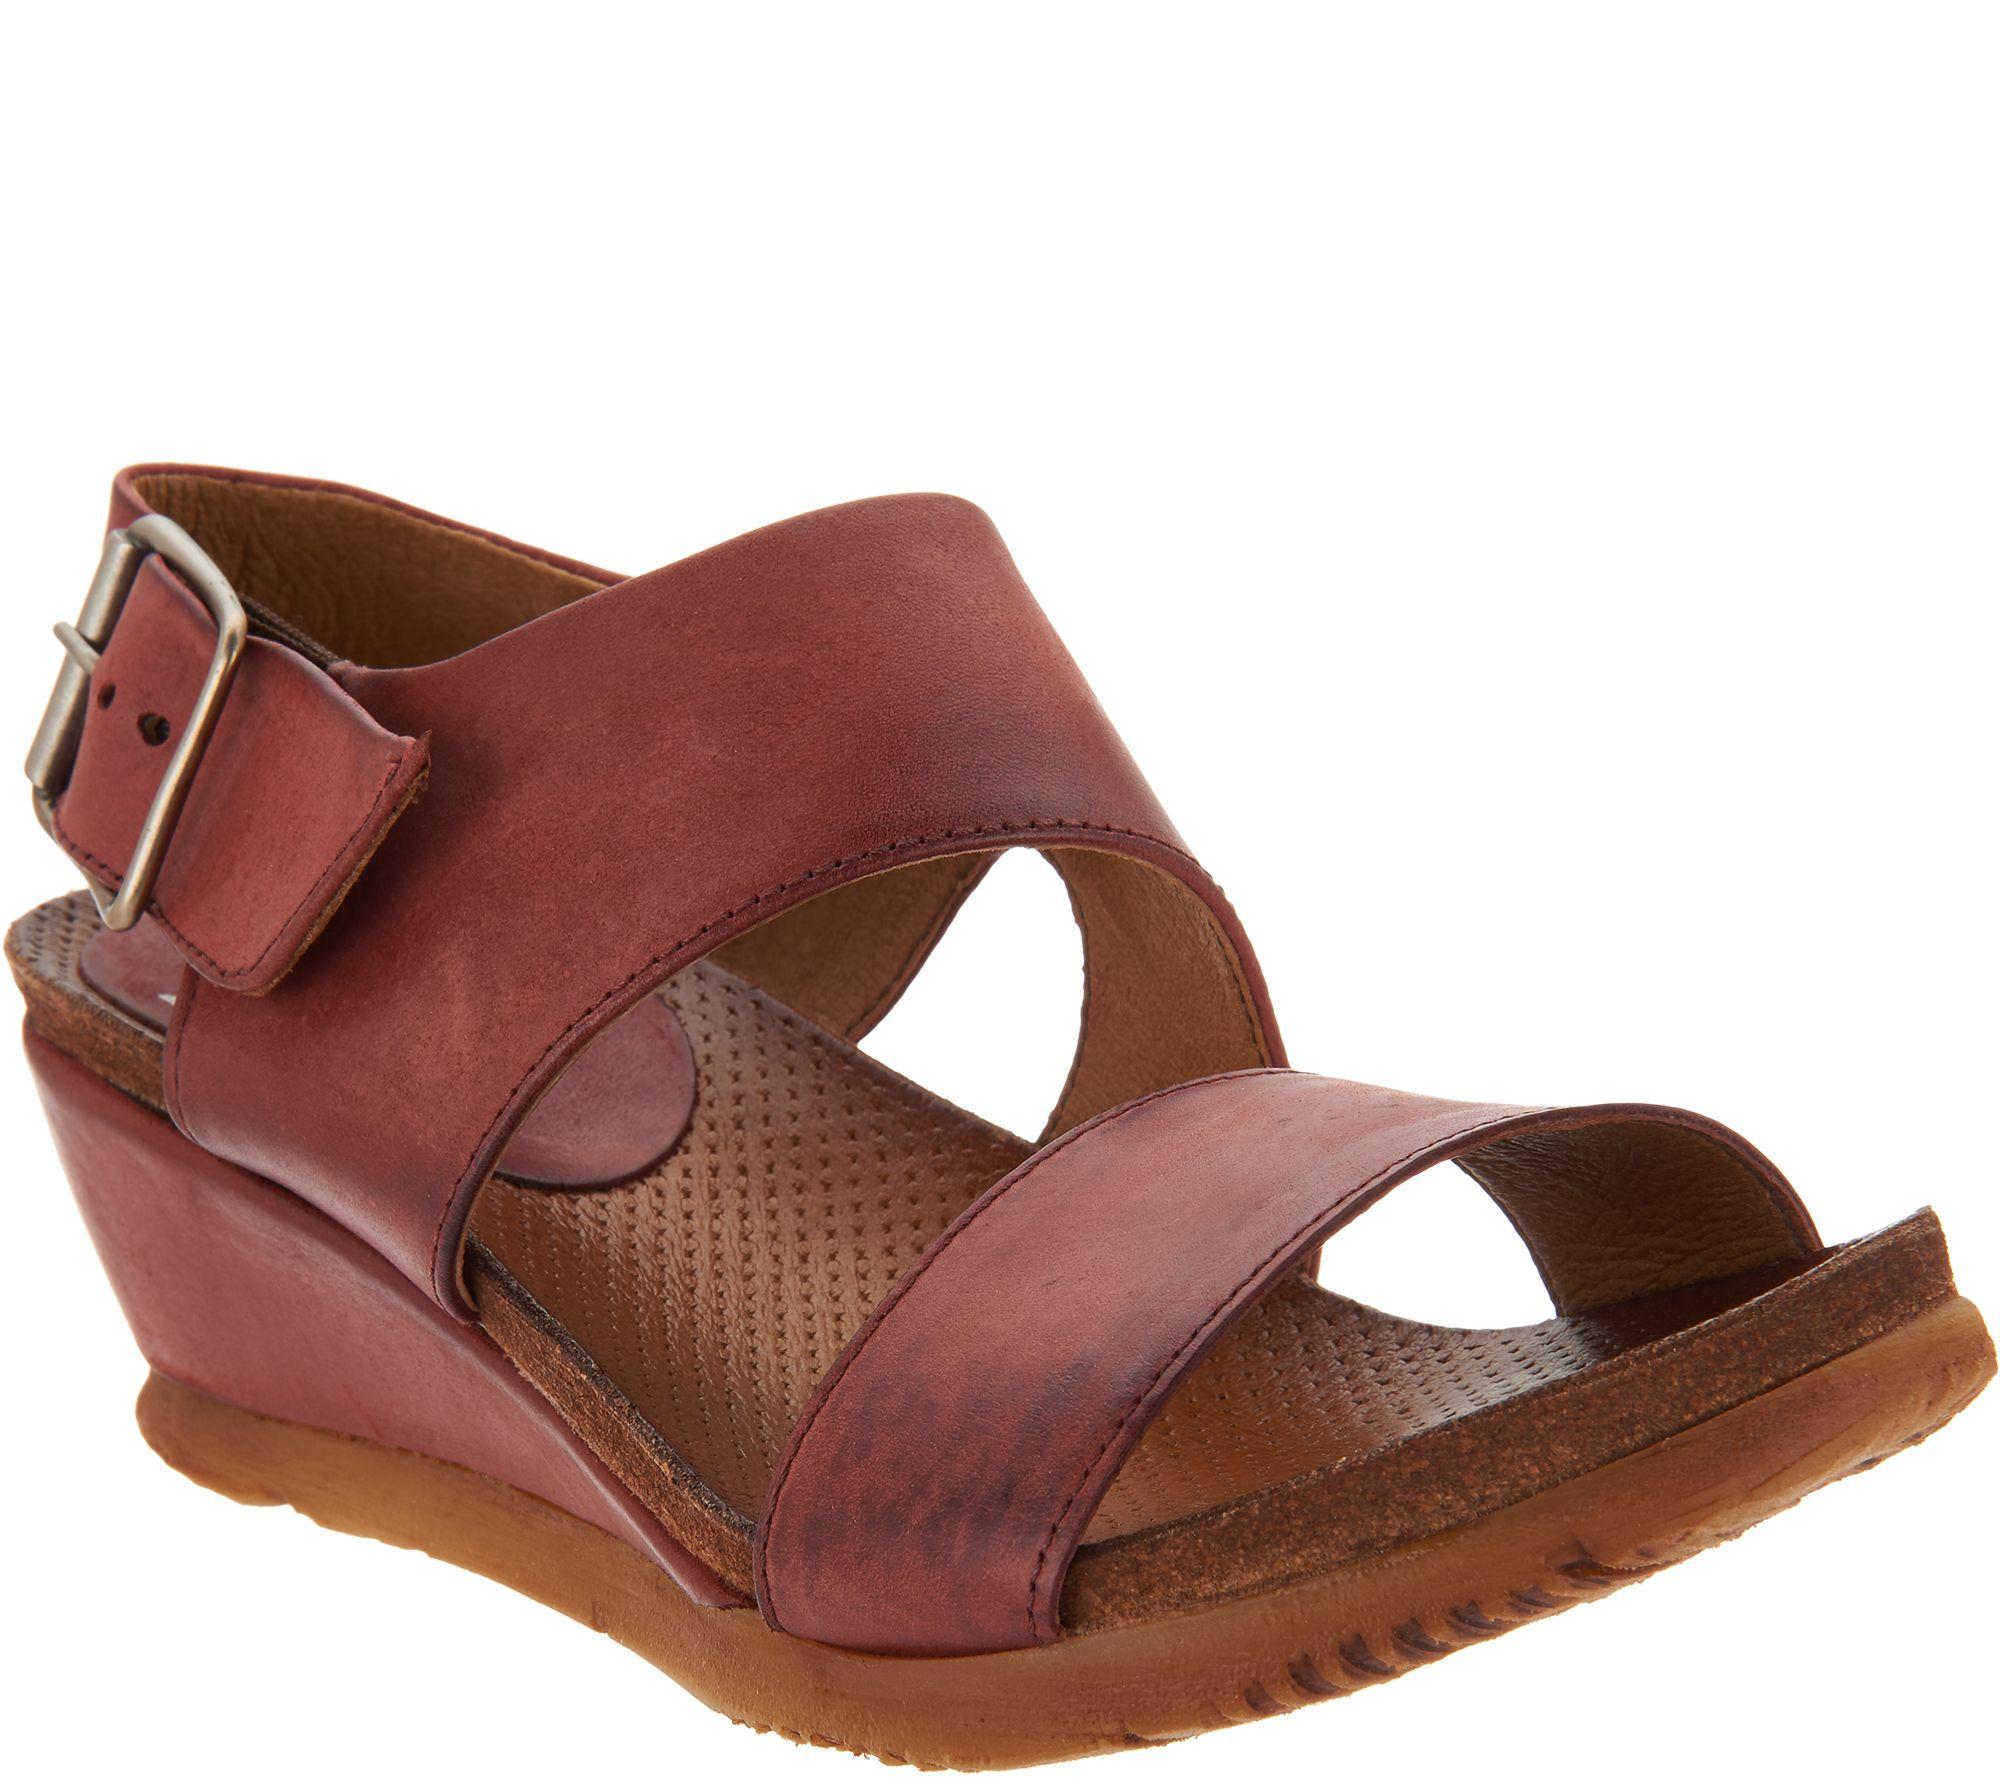 95bfee83c948 Miz Mooz Leather Wedge Sandals - Mariel - Page 1 — QVC.com